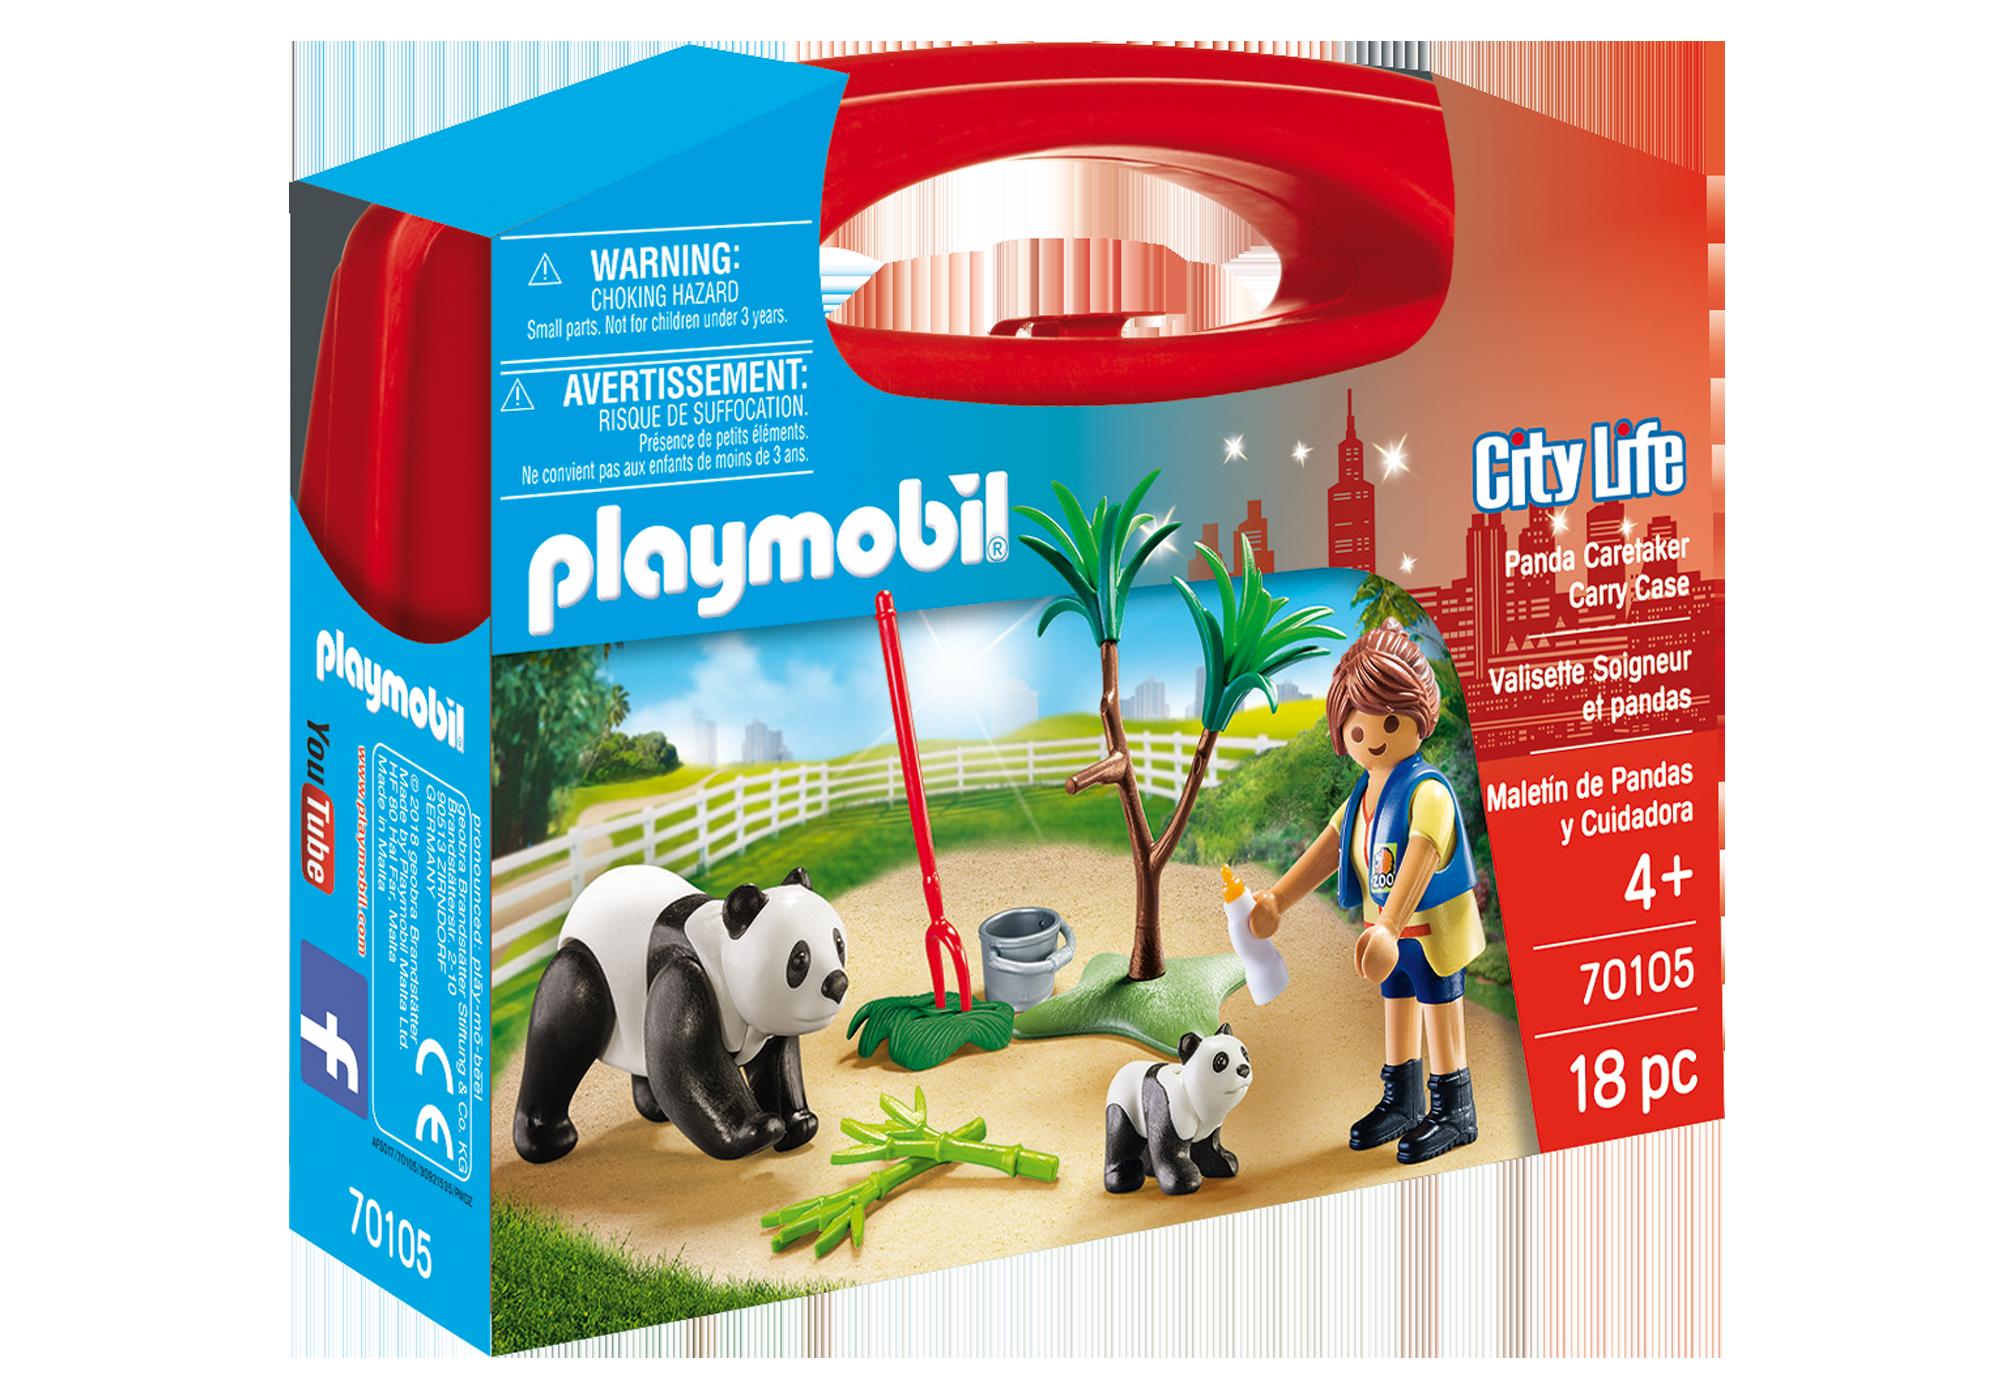 http://media.playmobil.com/i/playmobil/70105_product_box_front/Panda Caretaker Carry Case S